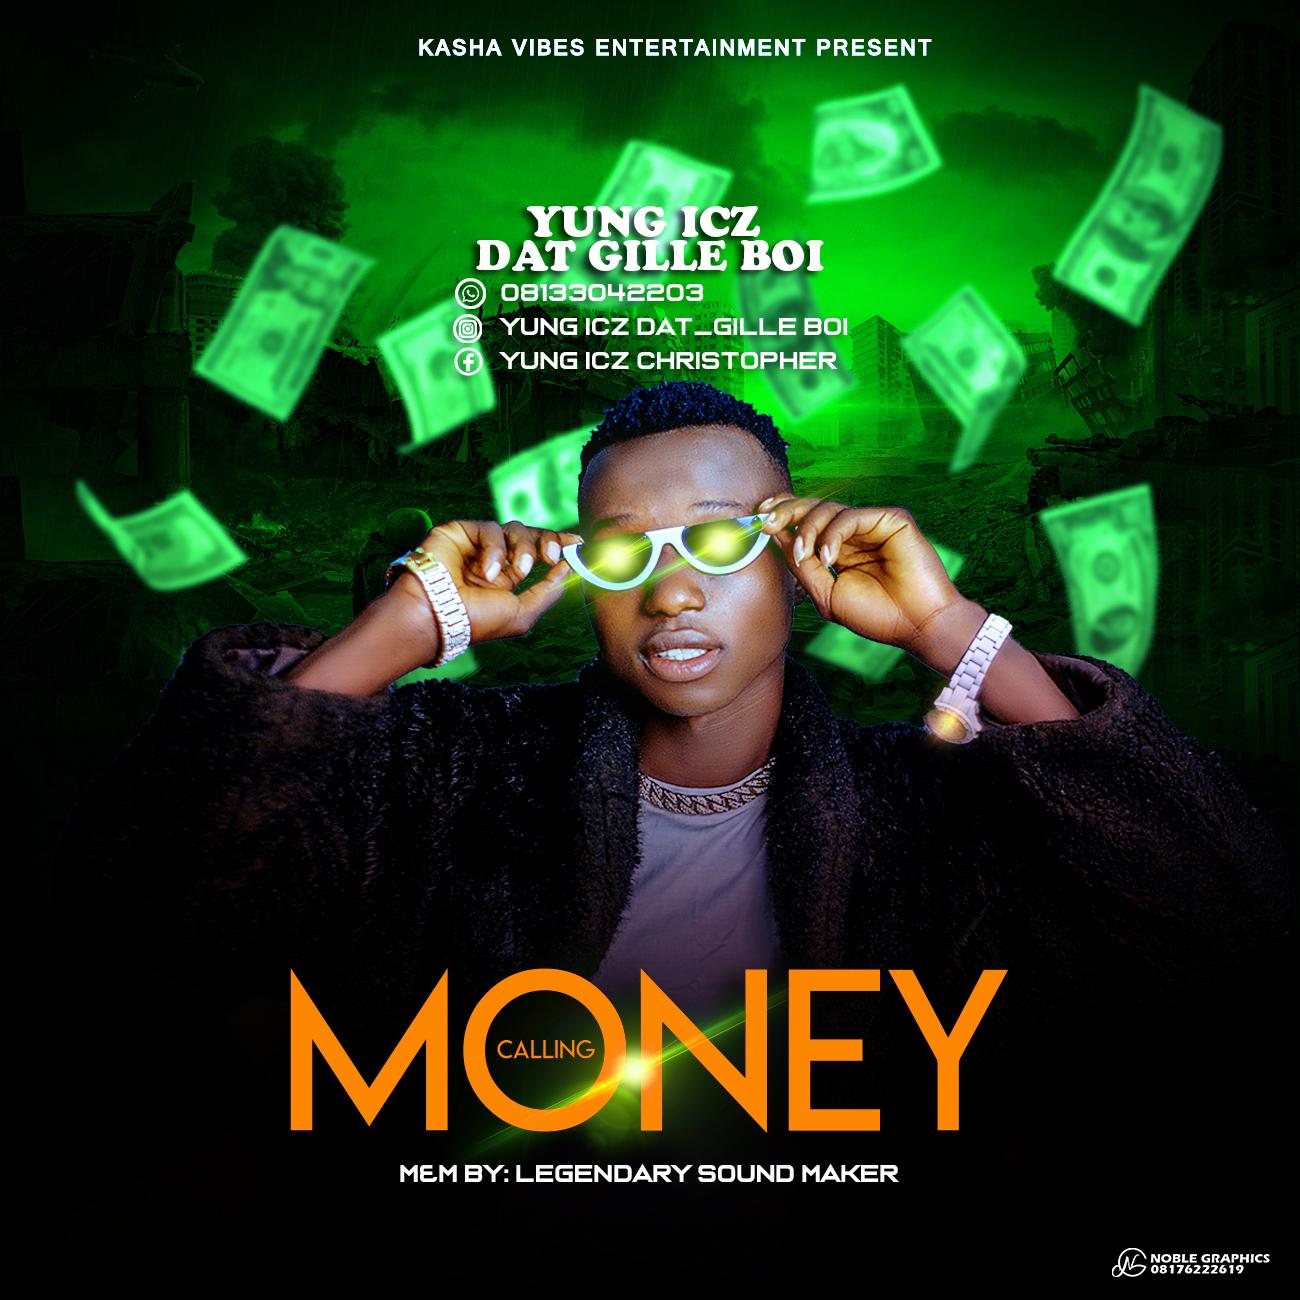 Yung ICZ Money Calling